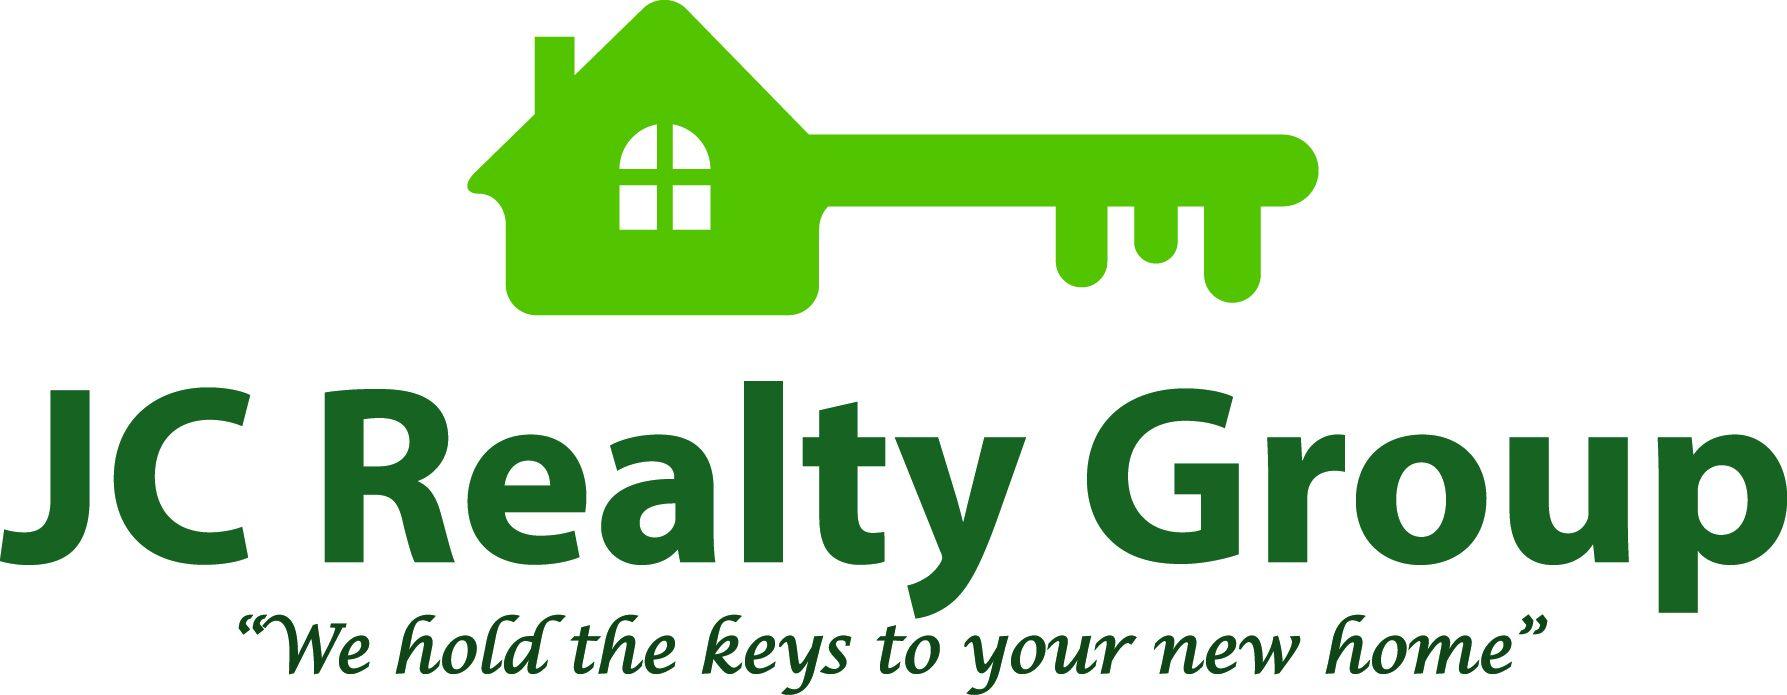 JC Realty, Inc. Logo